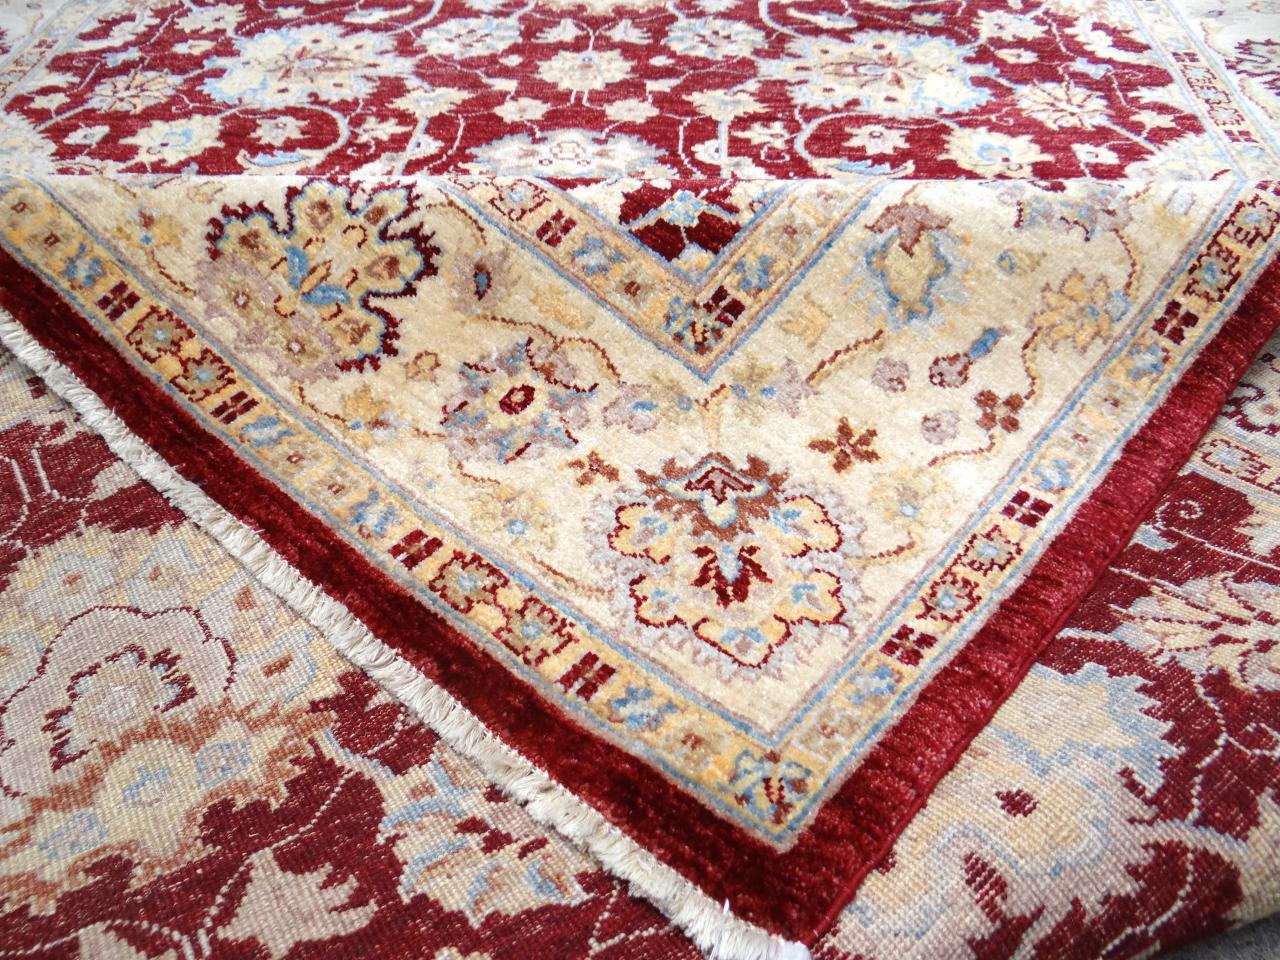 azarchoub fin tapis ziegler n 1014 289x196cm. Black Bedroom Furniture Sets. Home Design Ideas